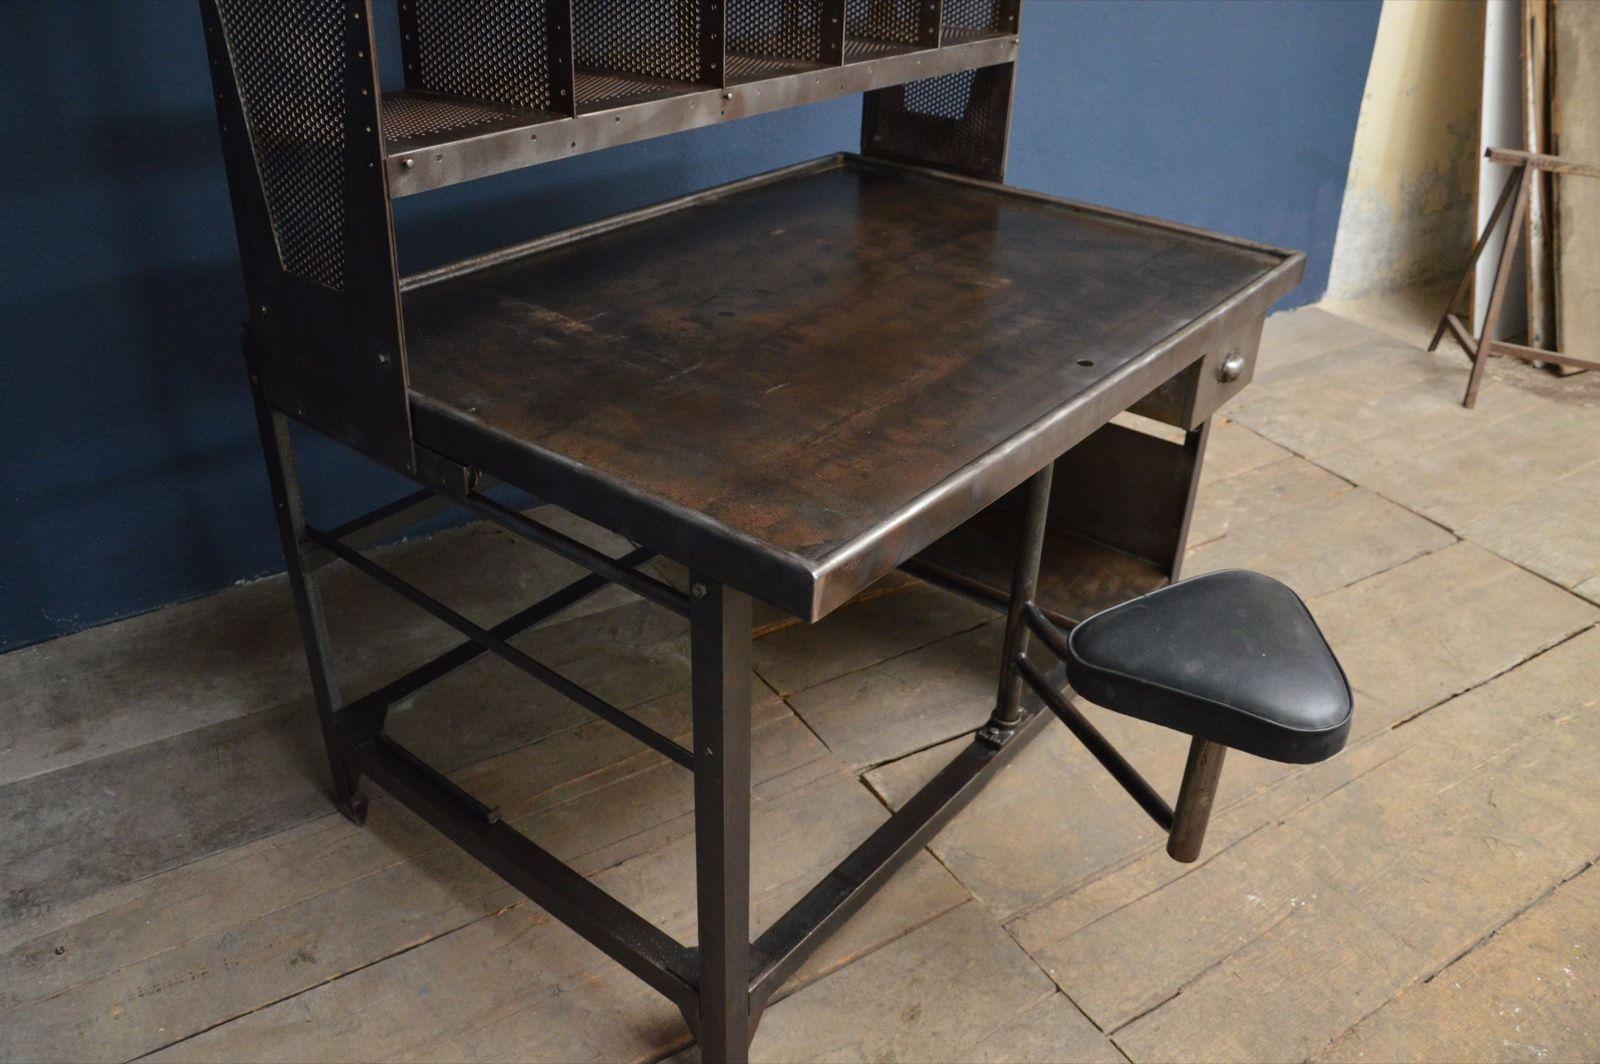 ancien meuble de tri postal mobilier industriel art. Black Bedroom Furniture Sets. Home Design Ideas